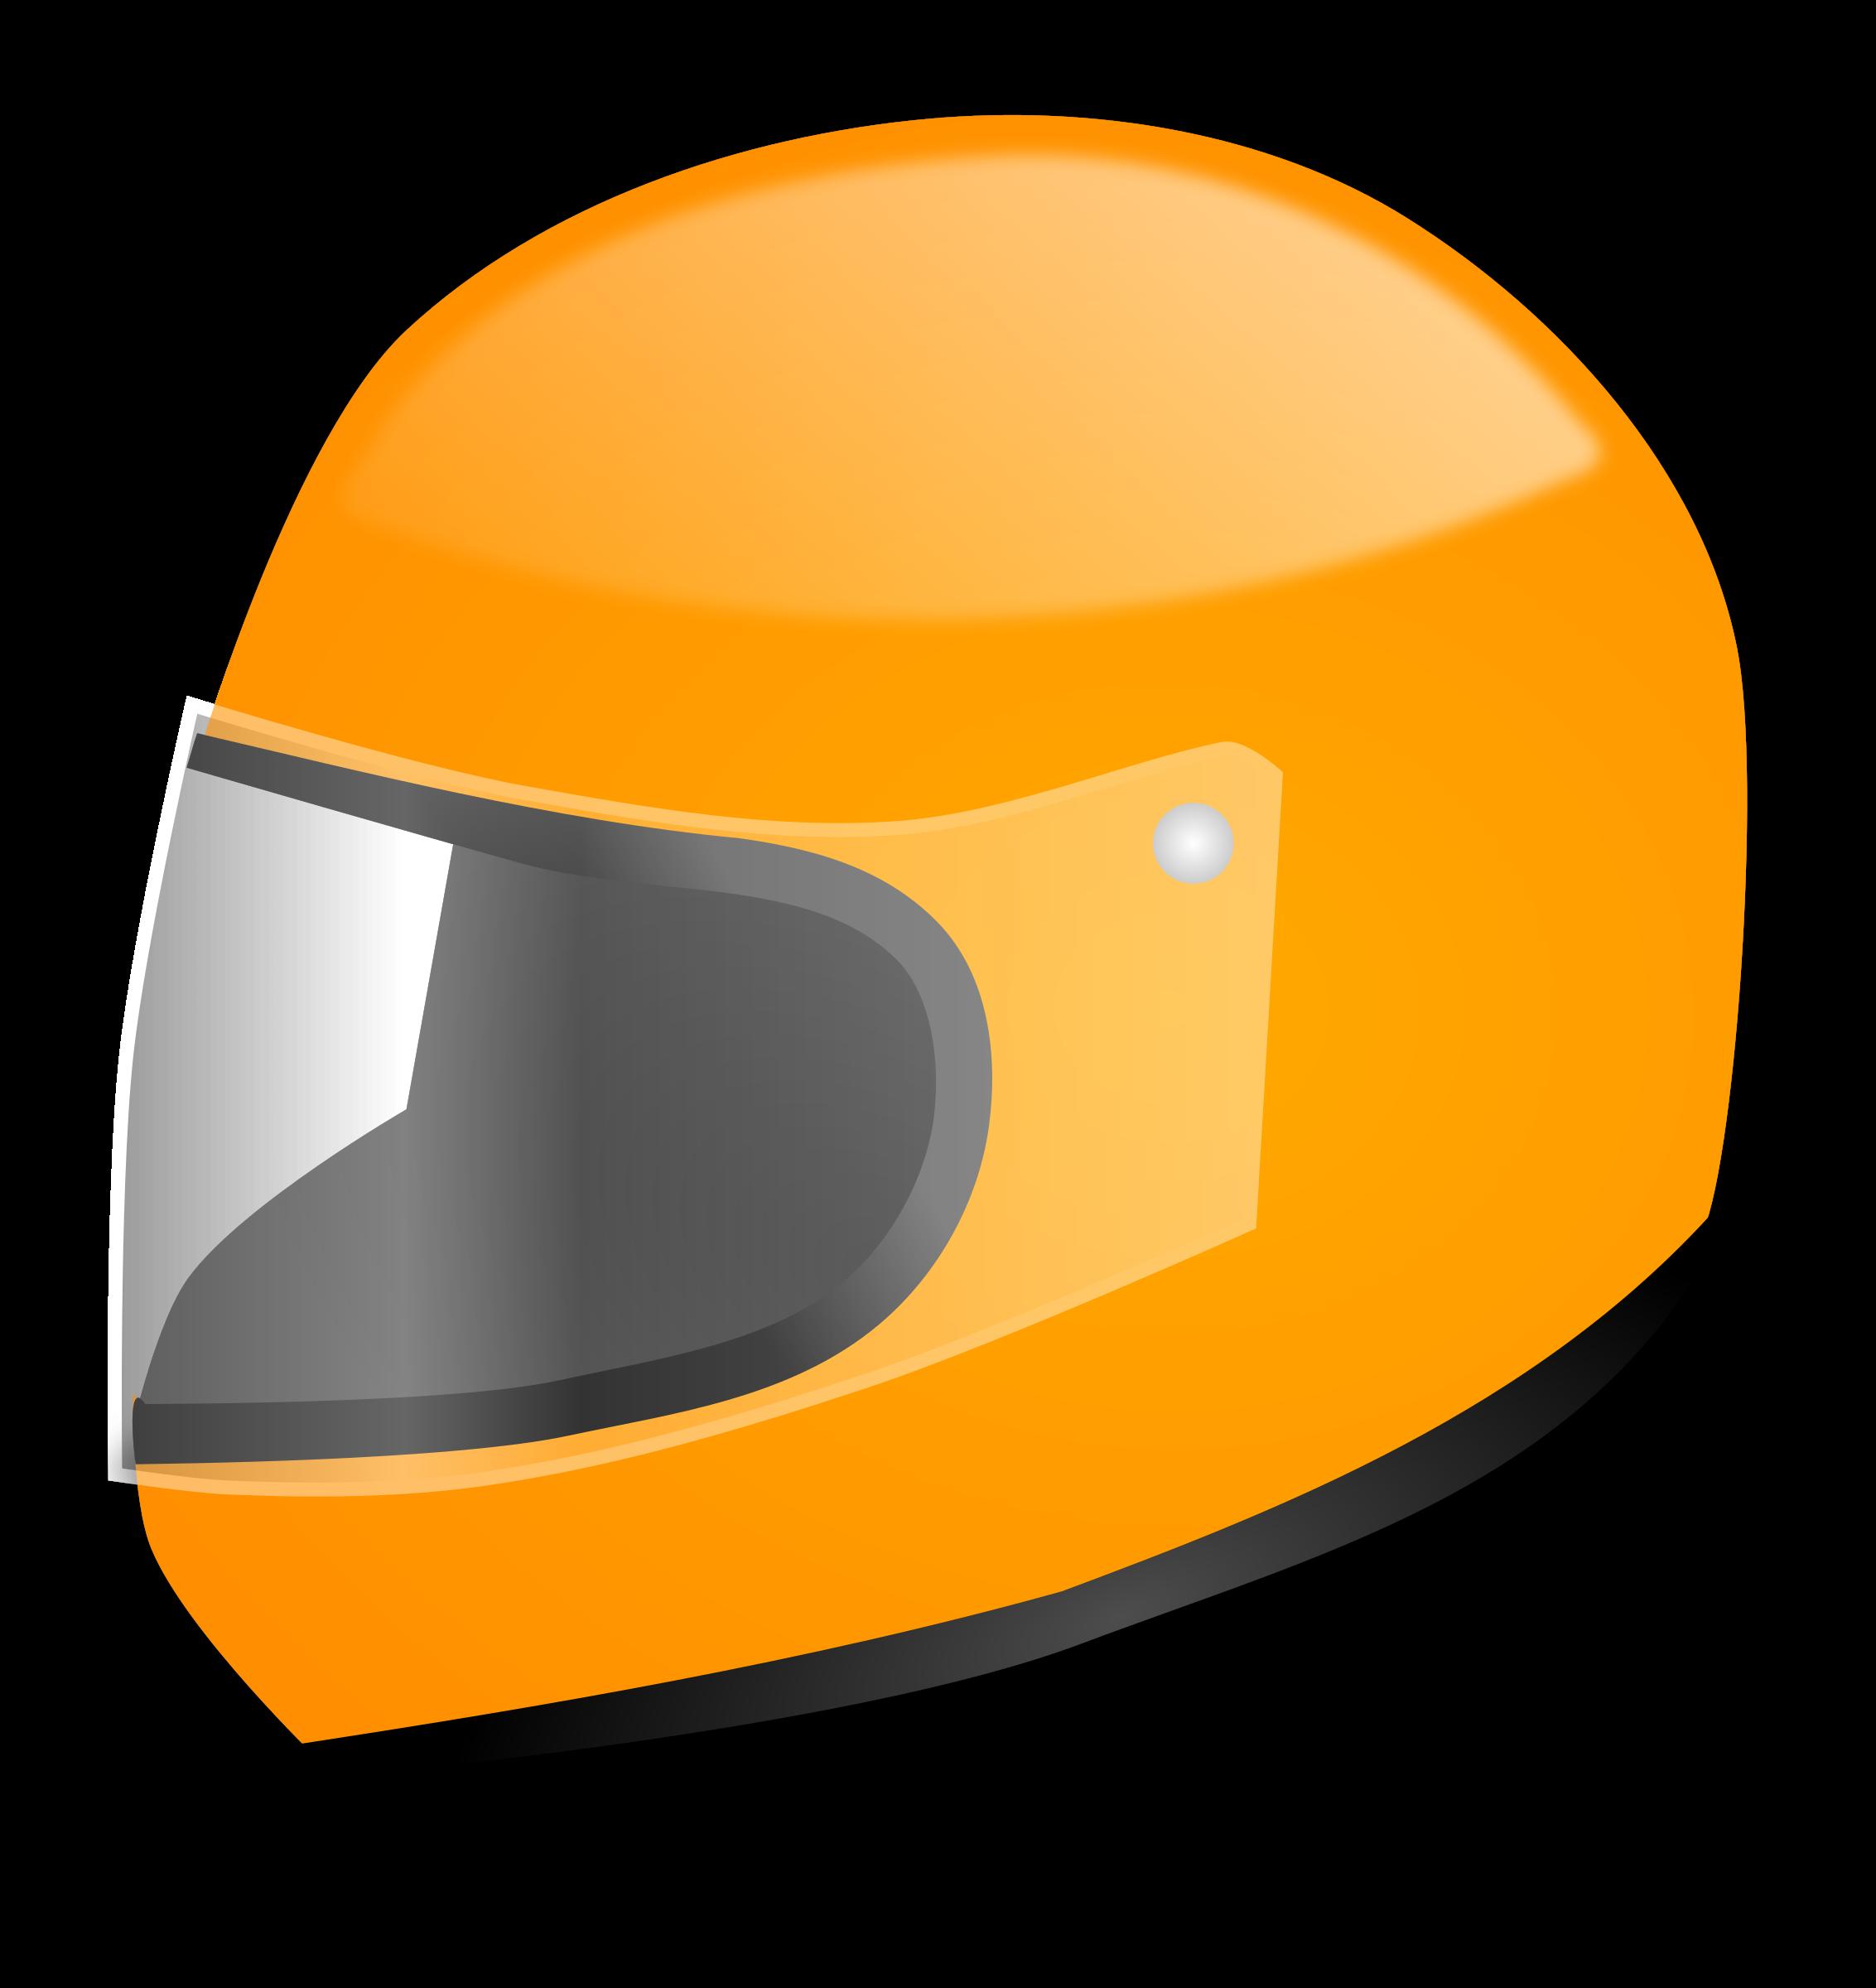 Racing helmet png. Clipart big image